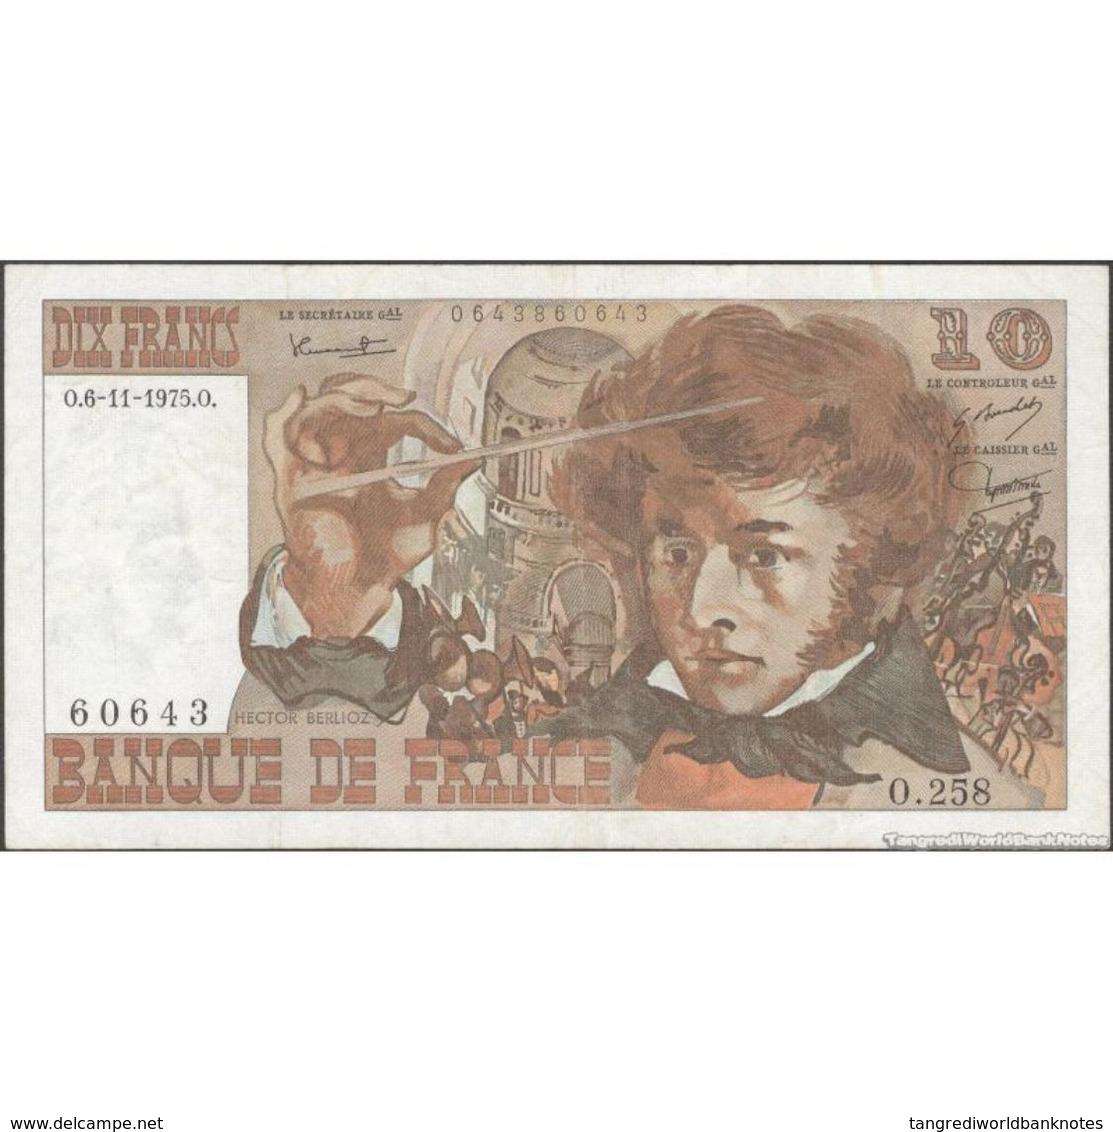 TWN - FRANCE 150b - 10 Francs 6.11.1975 60643 O.258 - Signatures: Bouchet, Tronche & Morant F/VF - 10 F 1972-1978 ''Berlioz''